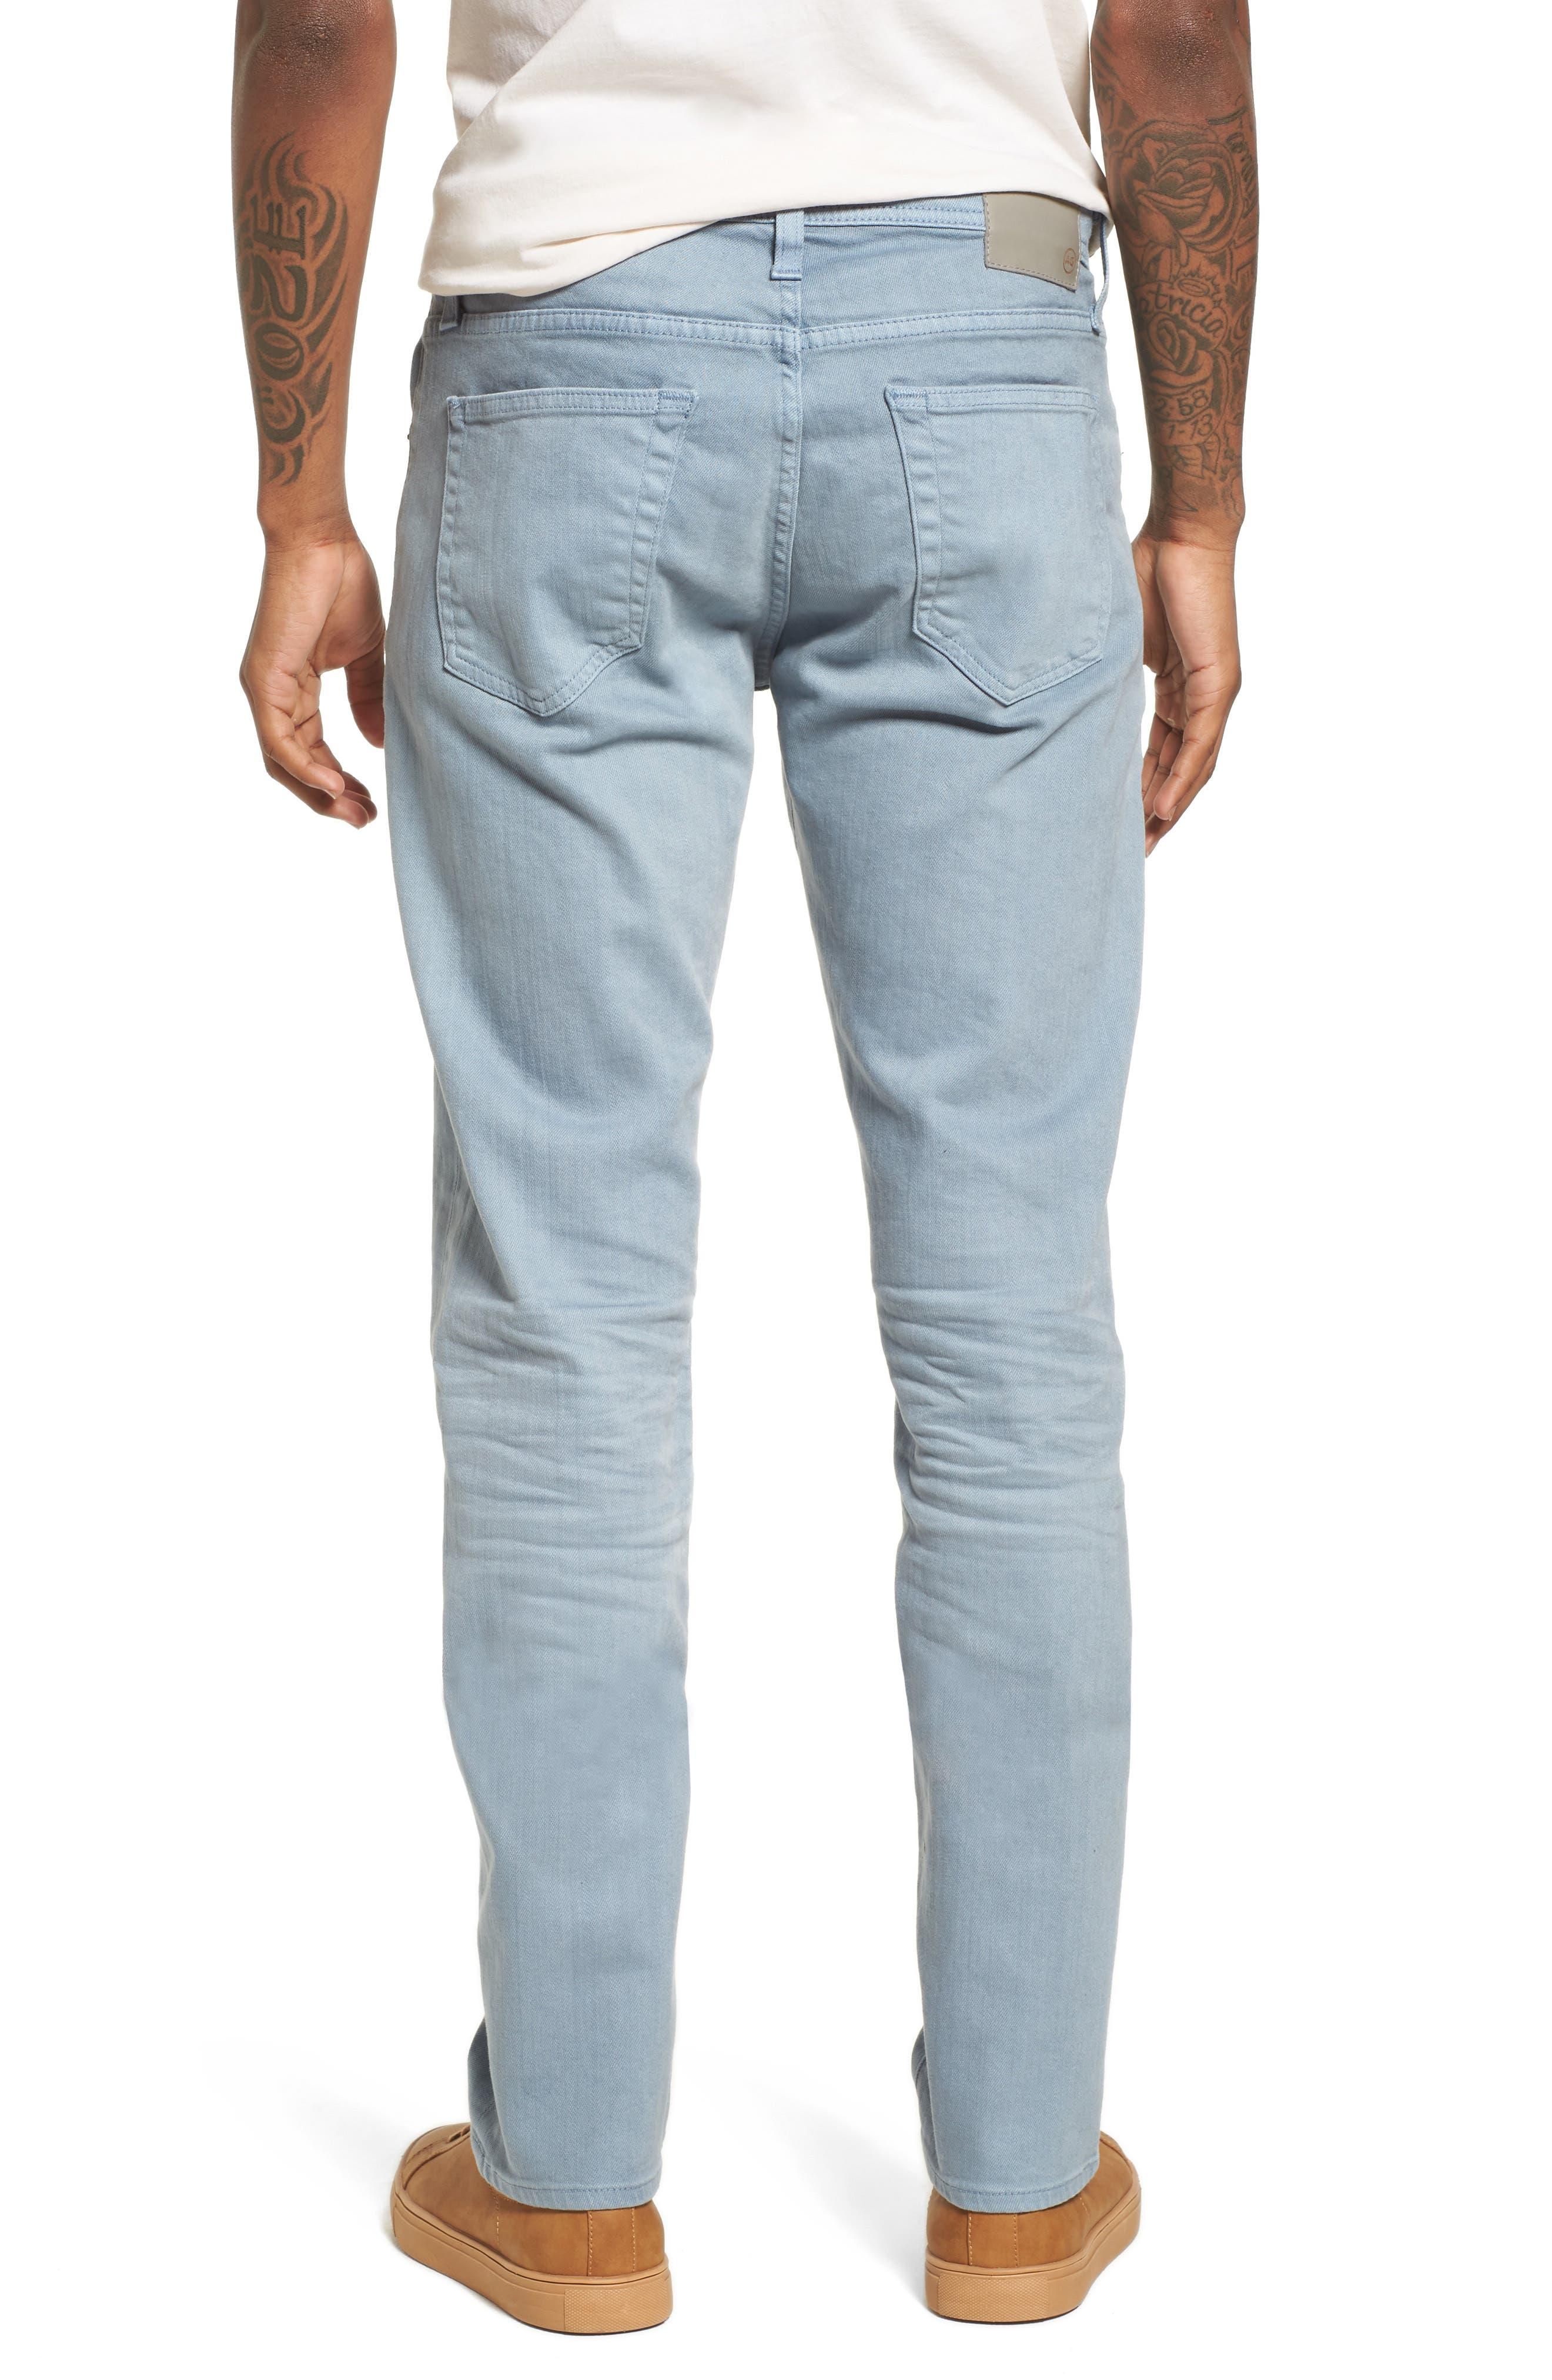 Tellis Slim Fit Jeans,                             Alternate thumbnail 2, color,                             480